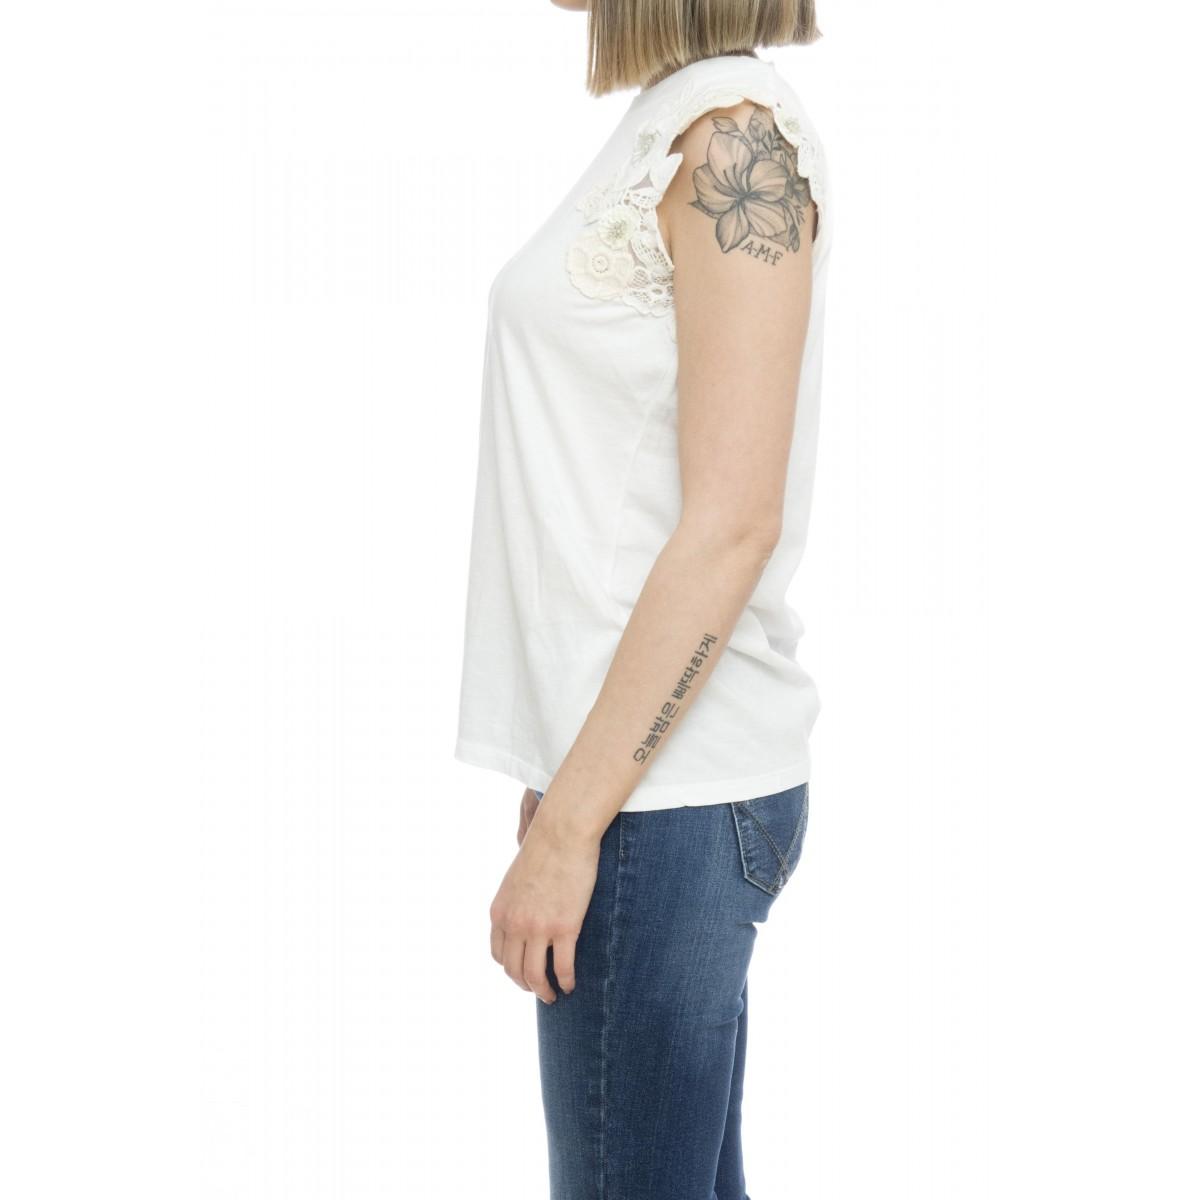 T-shirt donna - 2201 t-shirt ricamo senza manica